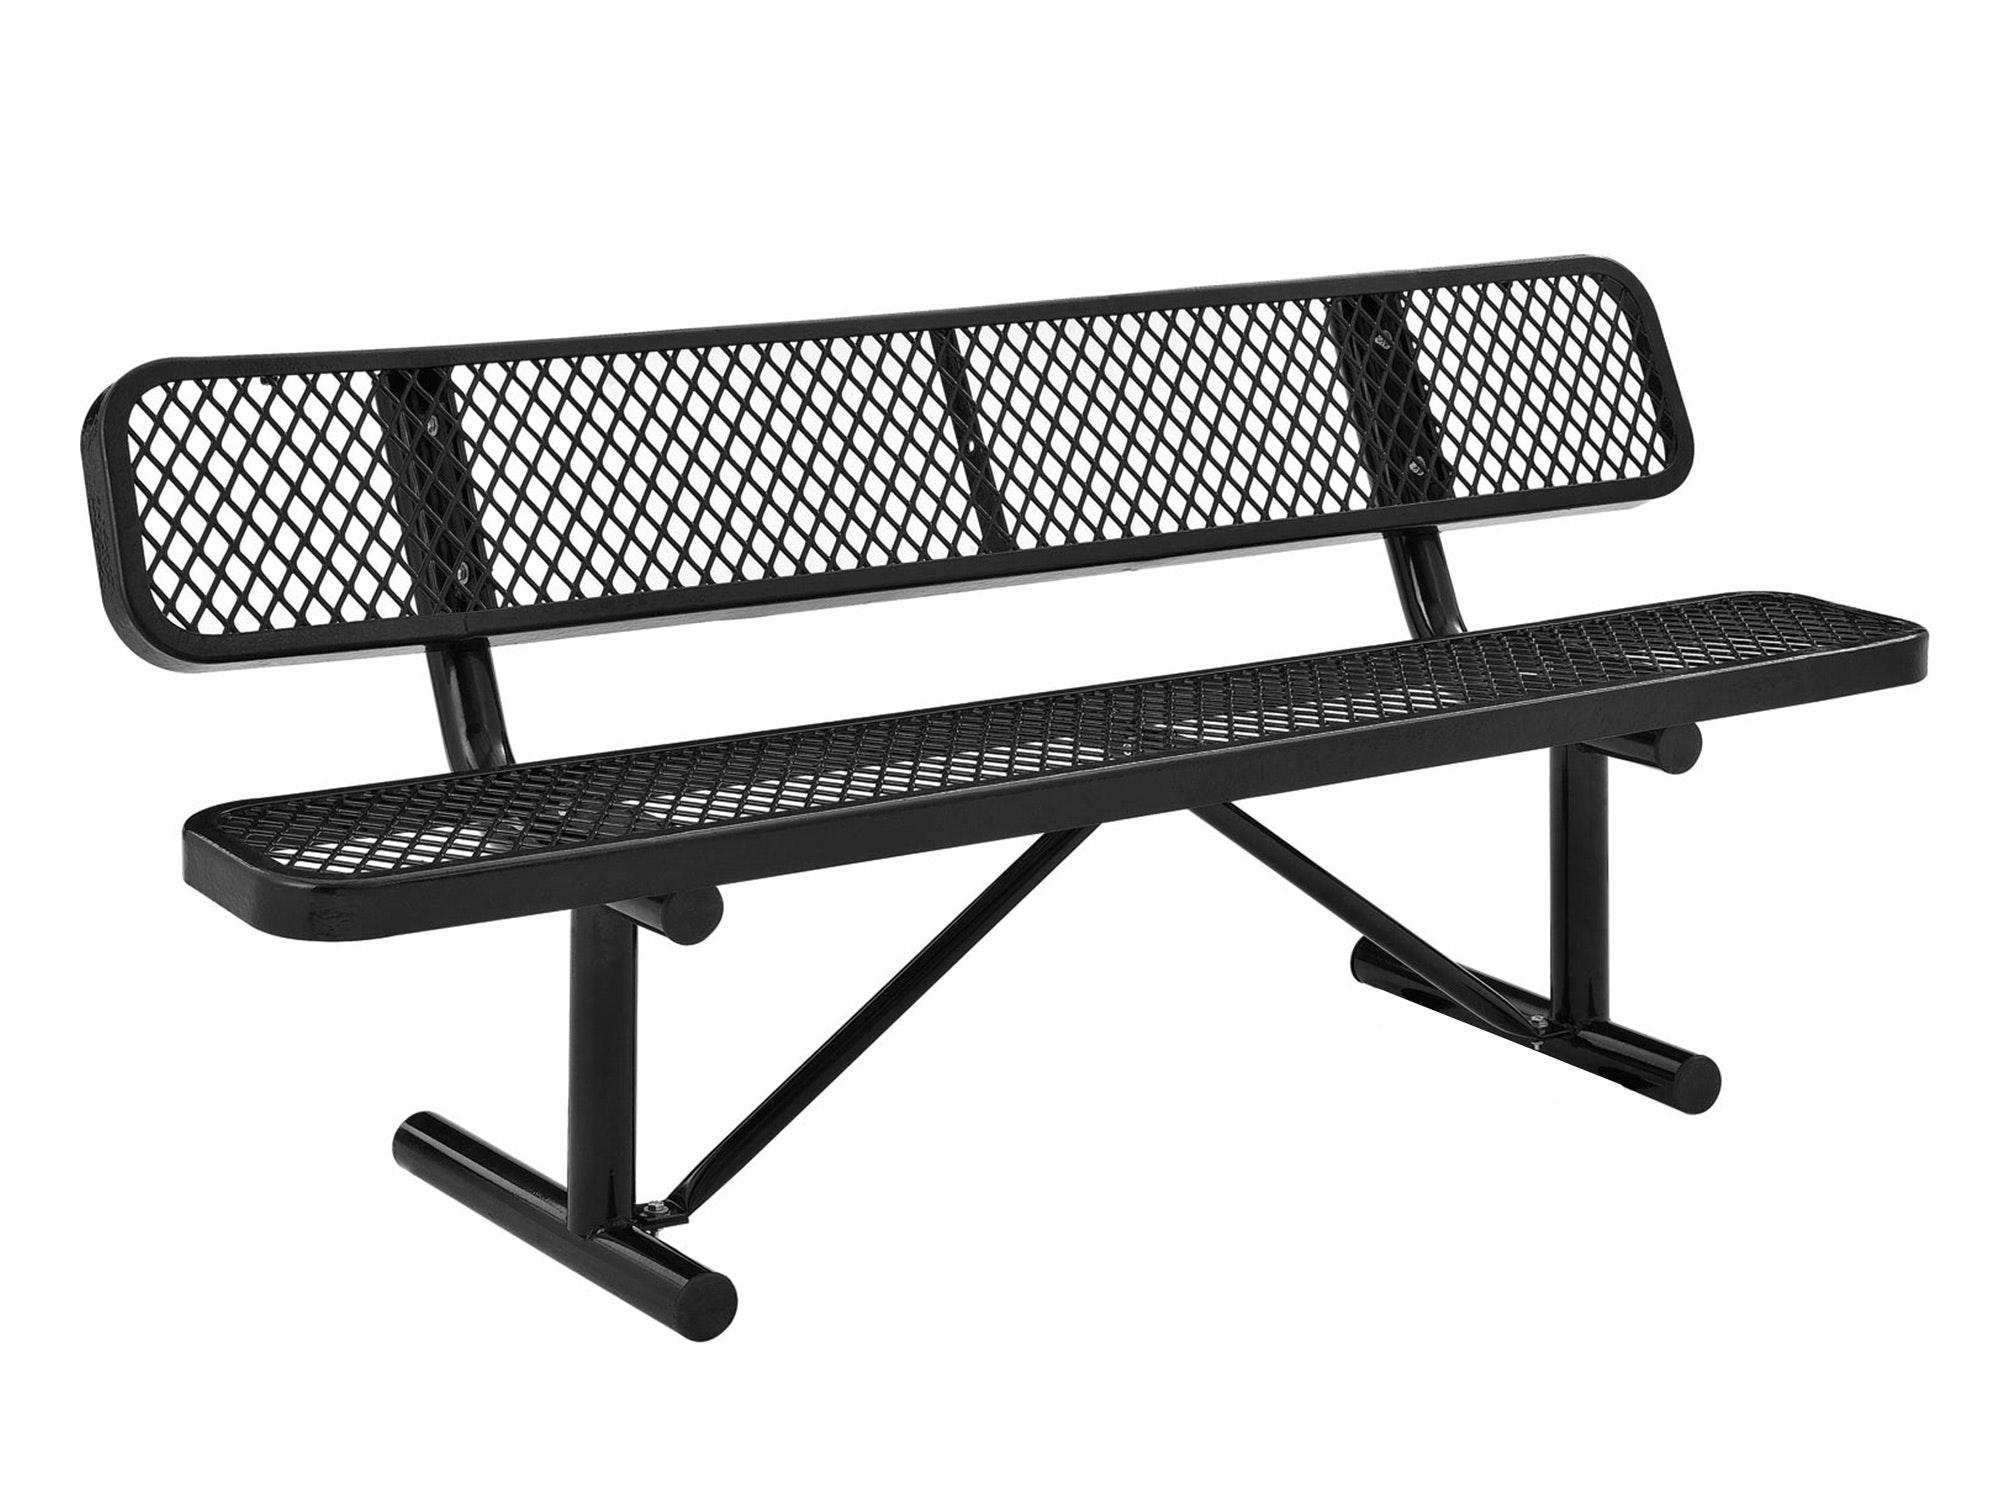 Superb Park Bench 3 Seater Black Creativecarmelina Interior Chair Design Creativecarmelinacom